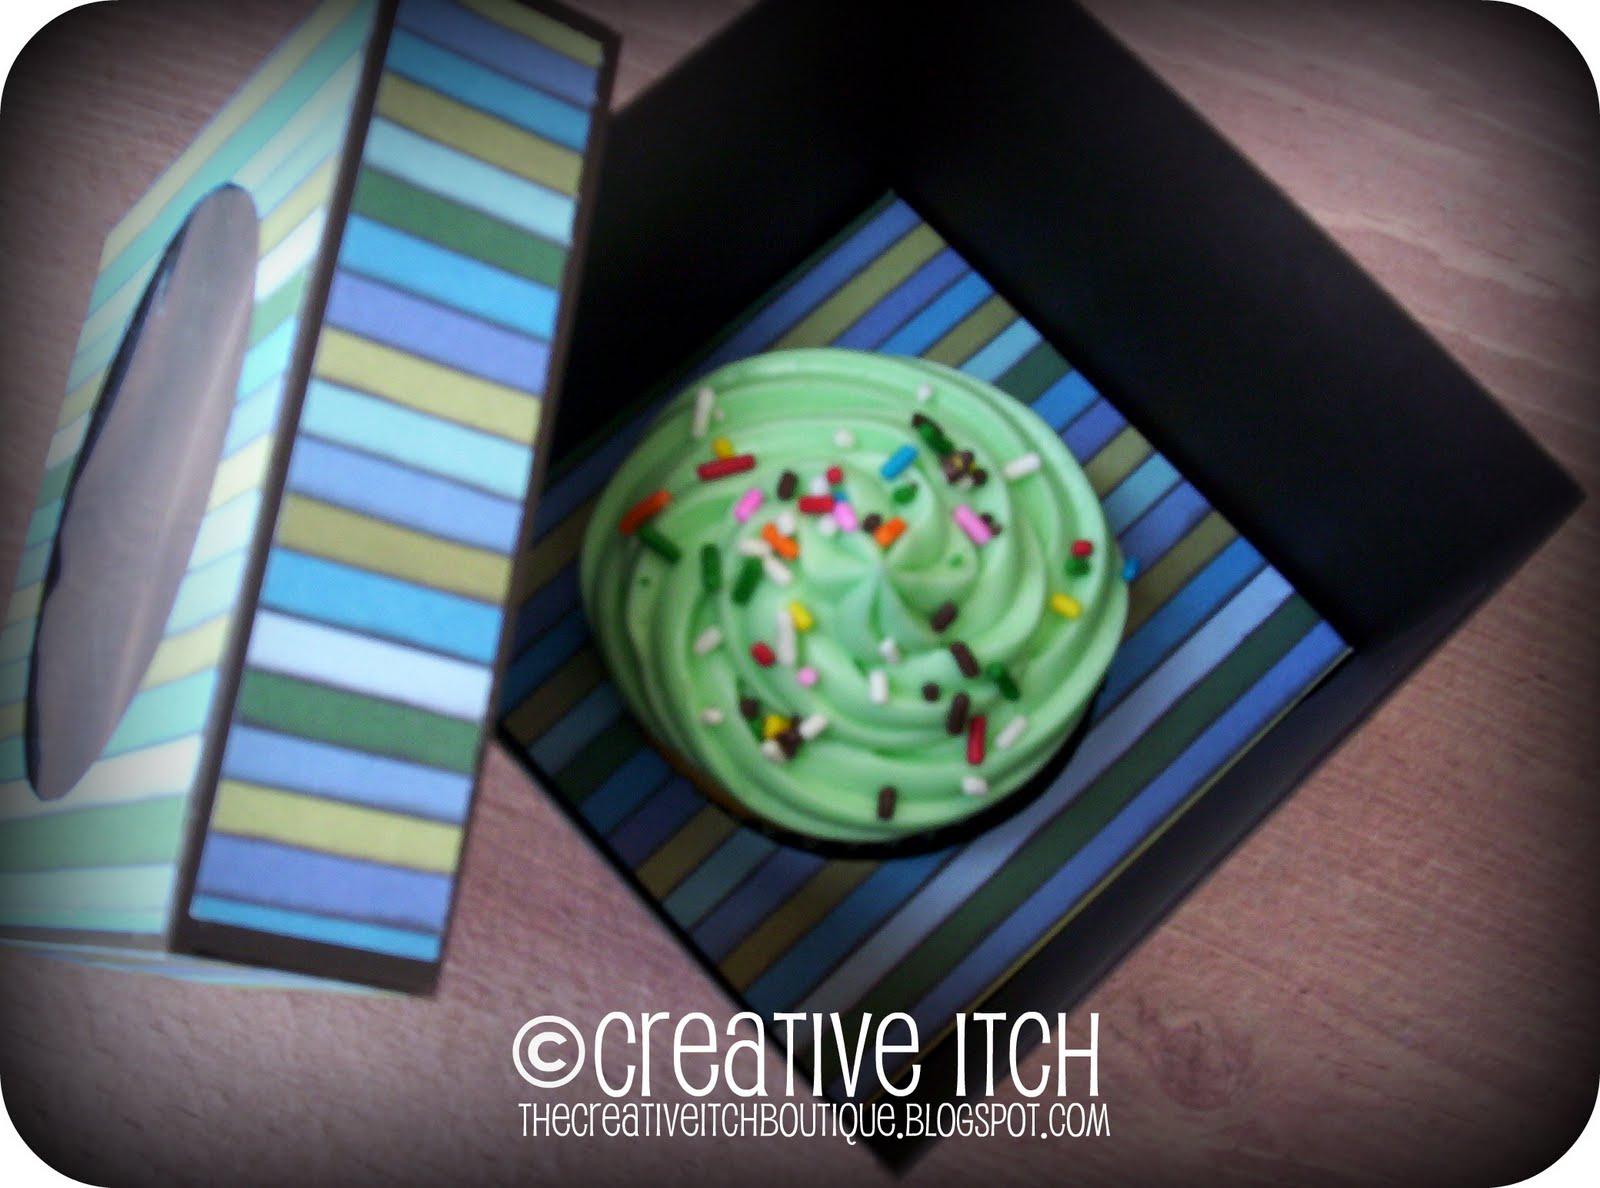 http://4.bp.blogspot.com/_6npsJrOioQ8/TEh2iJEhgmI/AAAAAAAACqA/vhIDzIvGqZU/s1600/Cupcake+Box+Lid+off%3B+Edited.jpg